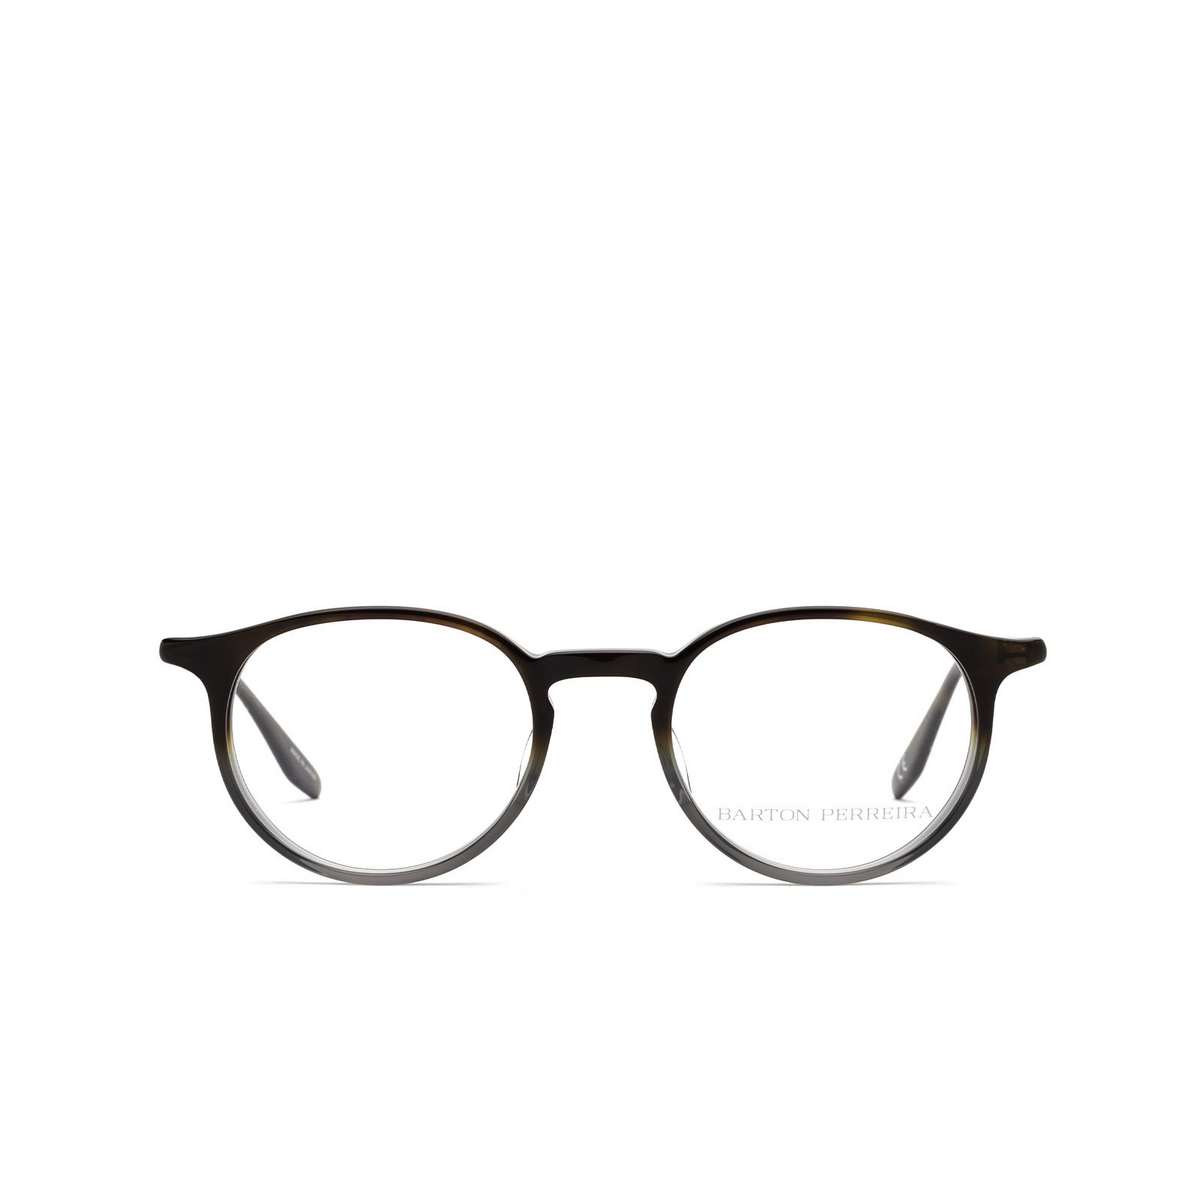 Barton Perreira® Round Eyeglasses: Norton BP5043 color Tortoise Stone Gradient 2HR - front view.